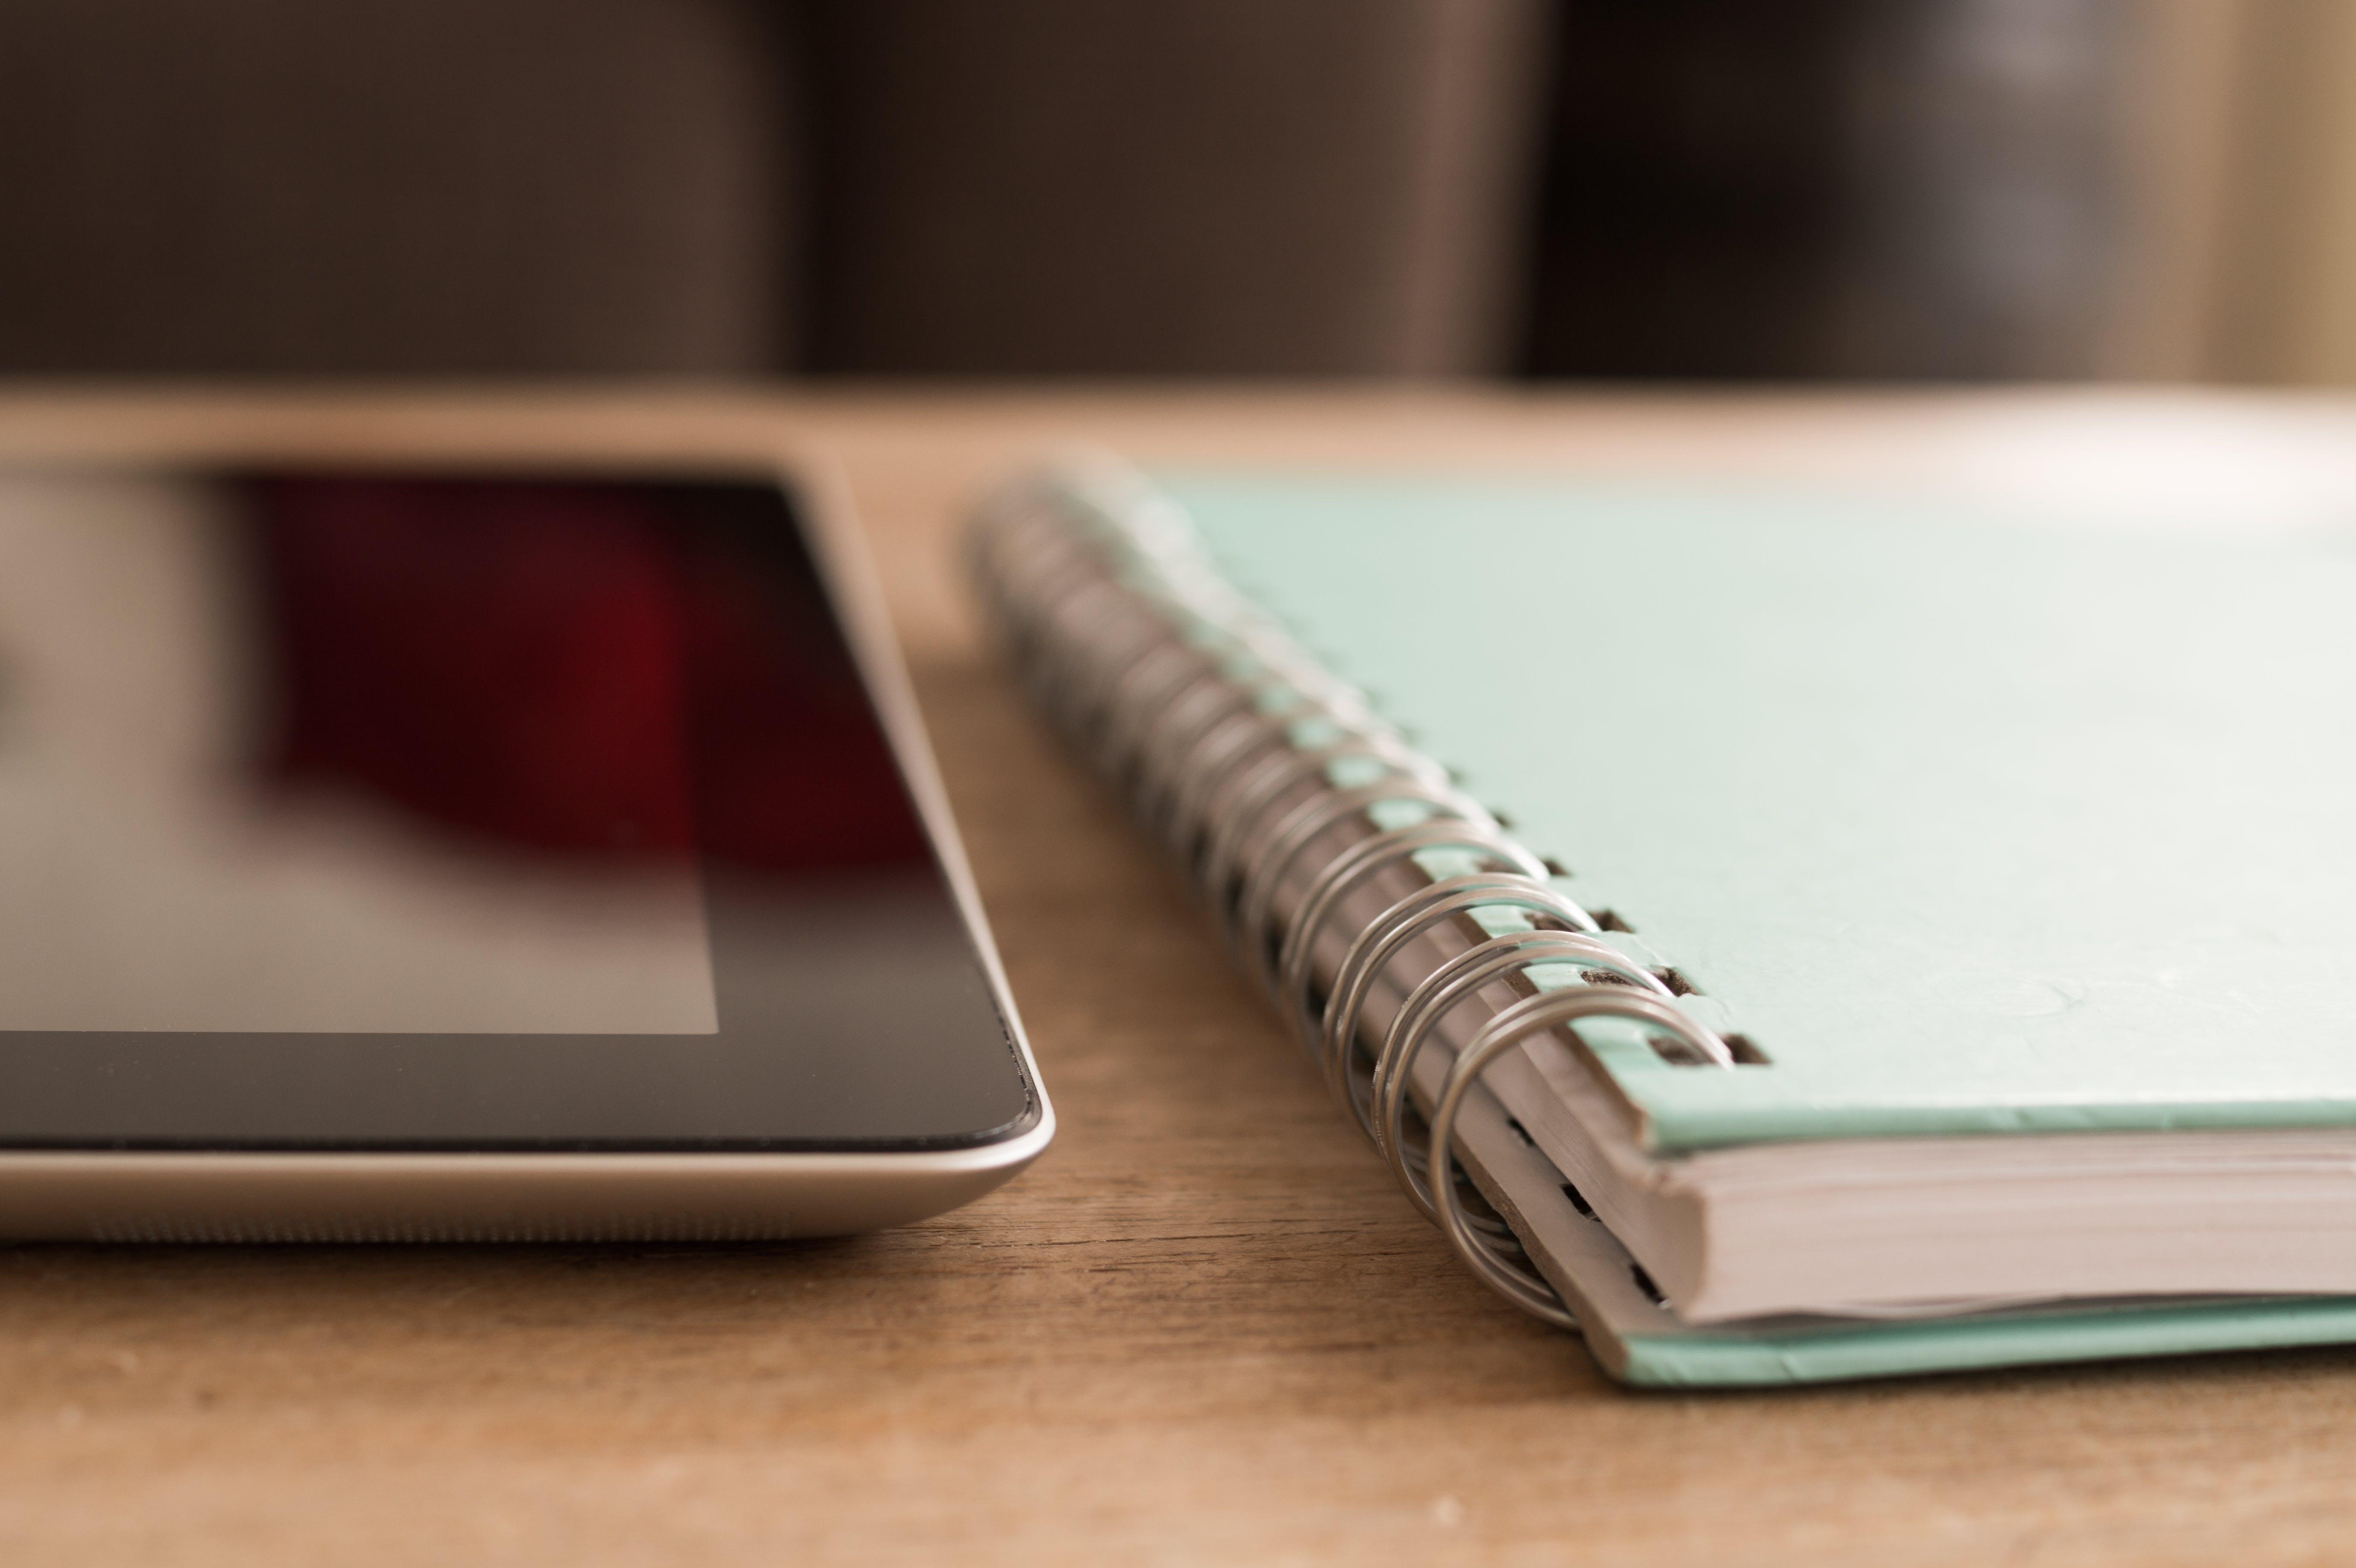 desk, ipad, notebook